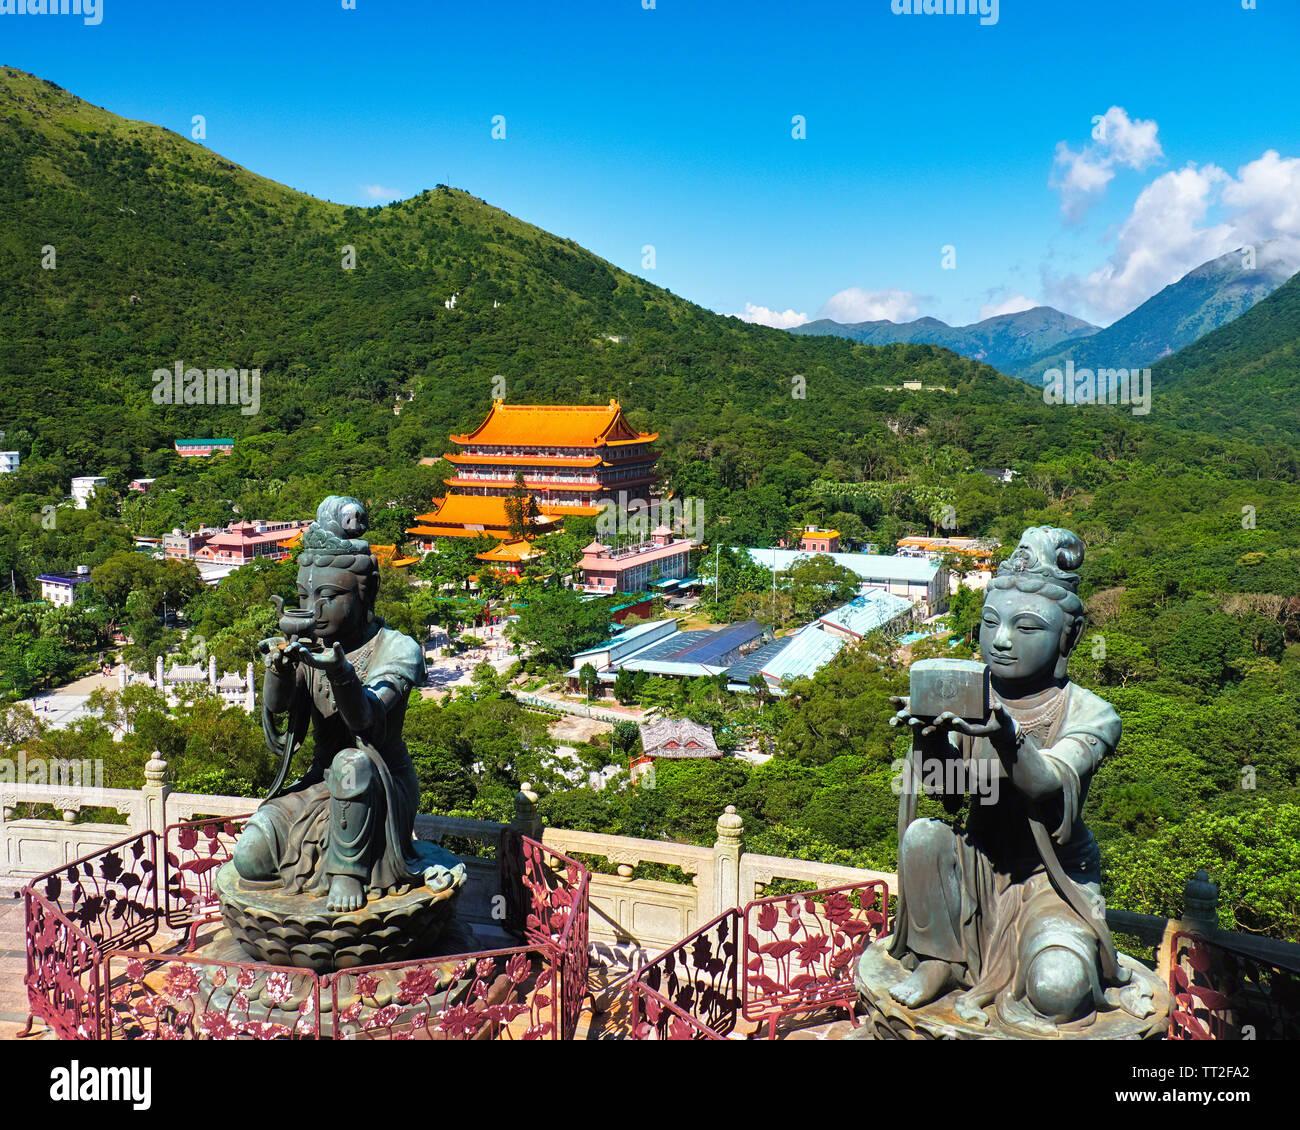 Two of the Six Deva statues Offering Gifts to the Tian Tan Buddha, Lantau Island, Hong Kong Stock Photo